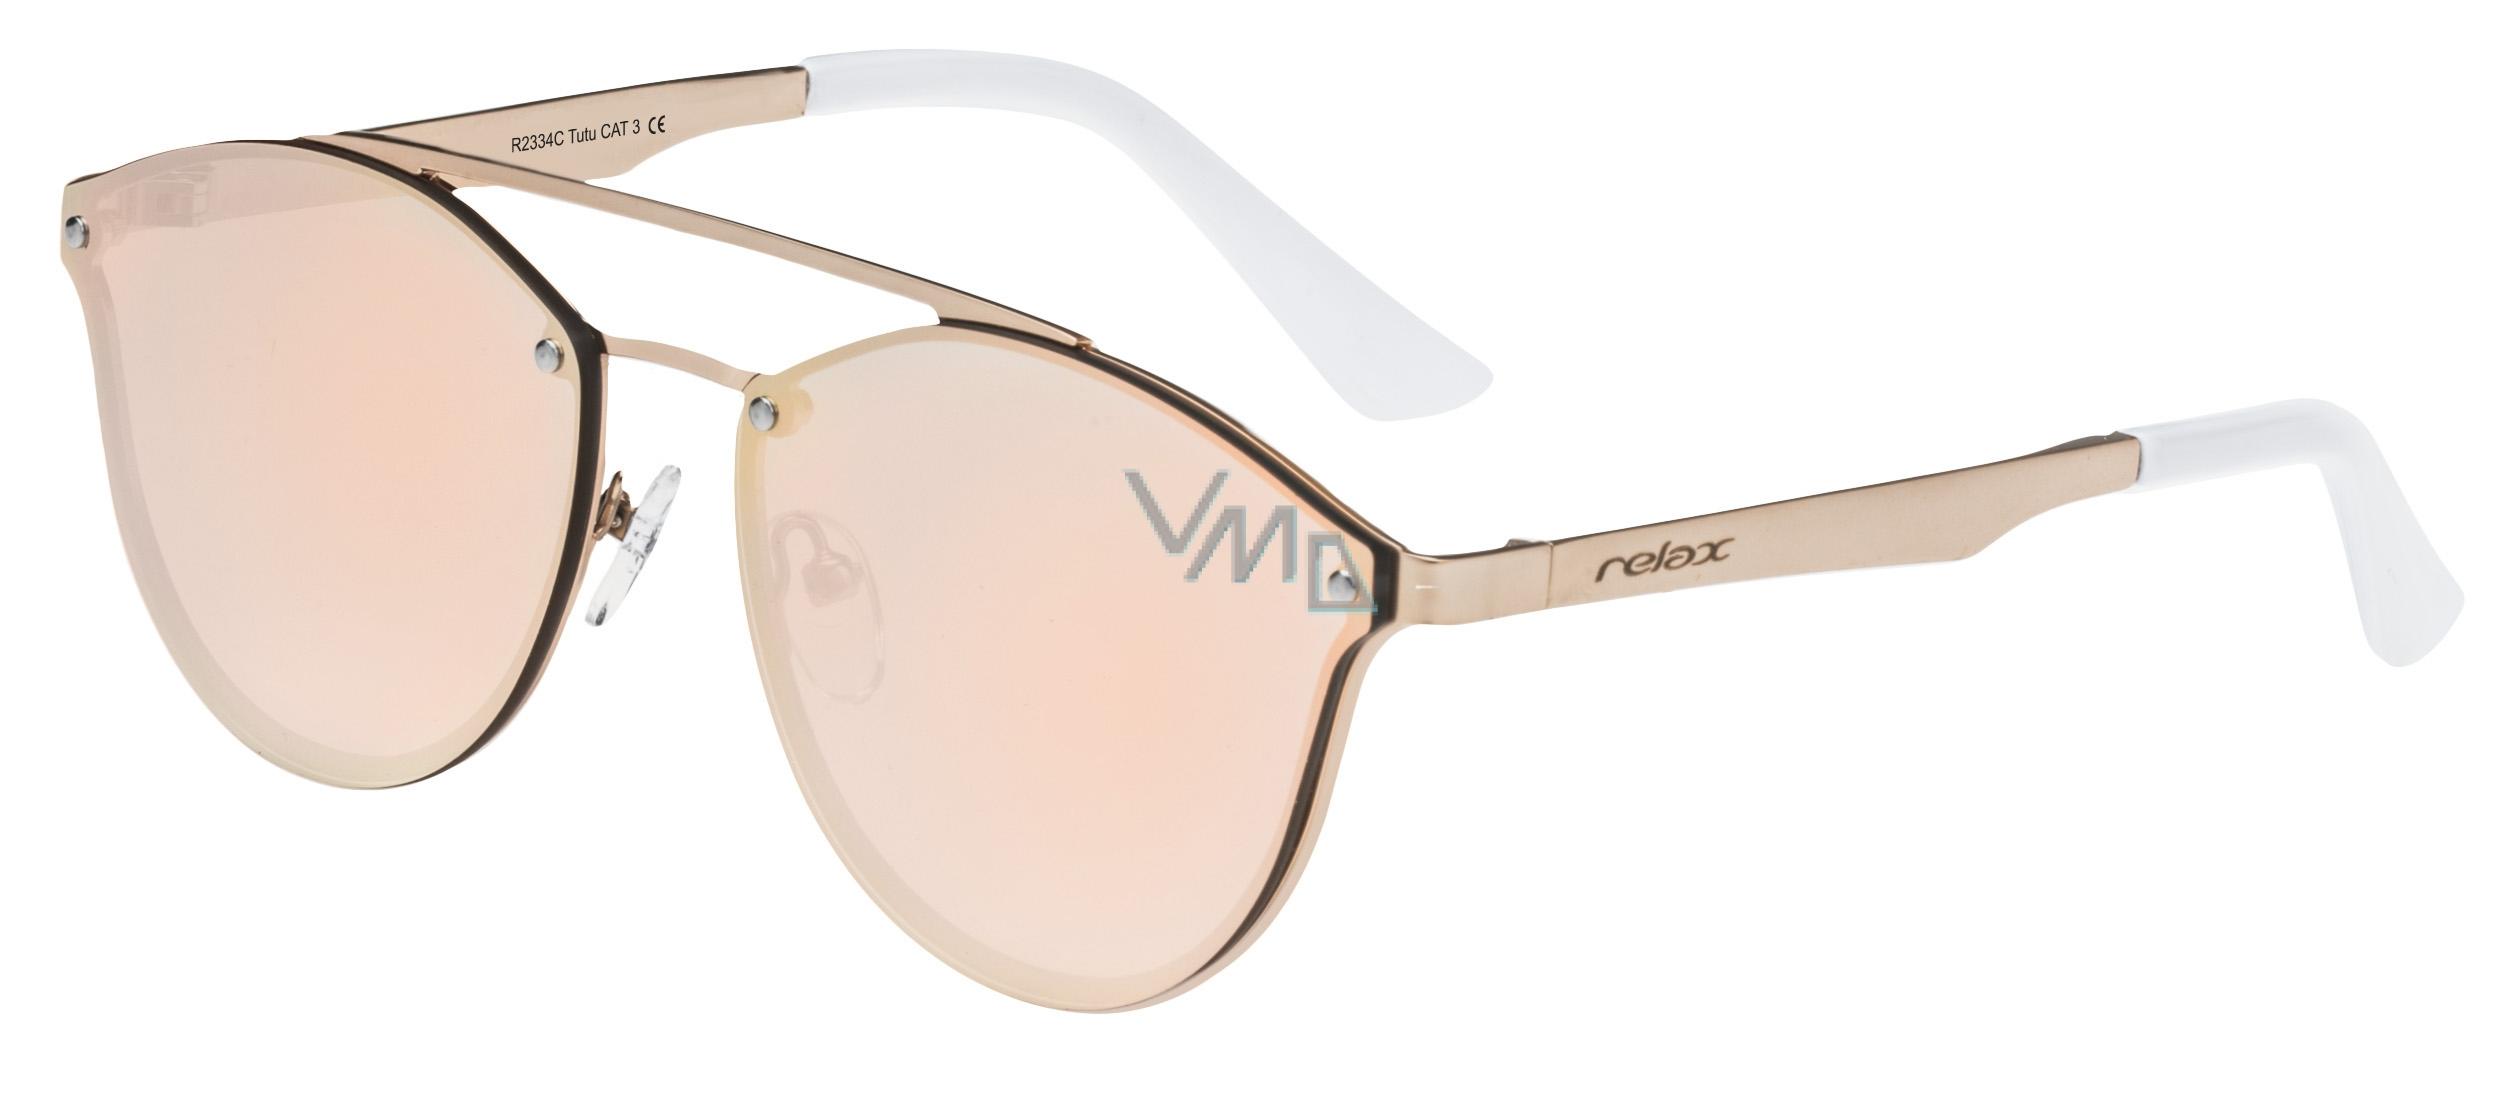 69457b790 Relax sunglasses Tutu R2334C - VMD parfumerie - drogerie